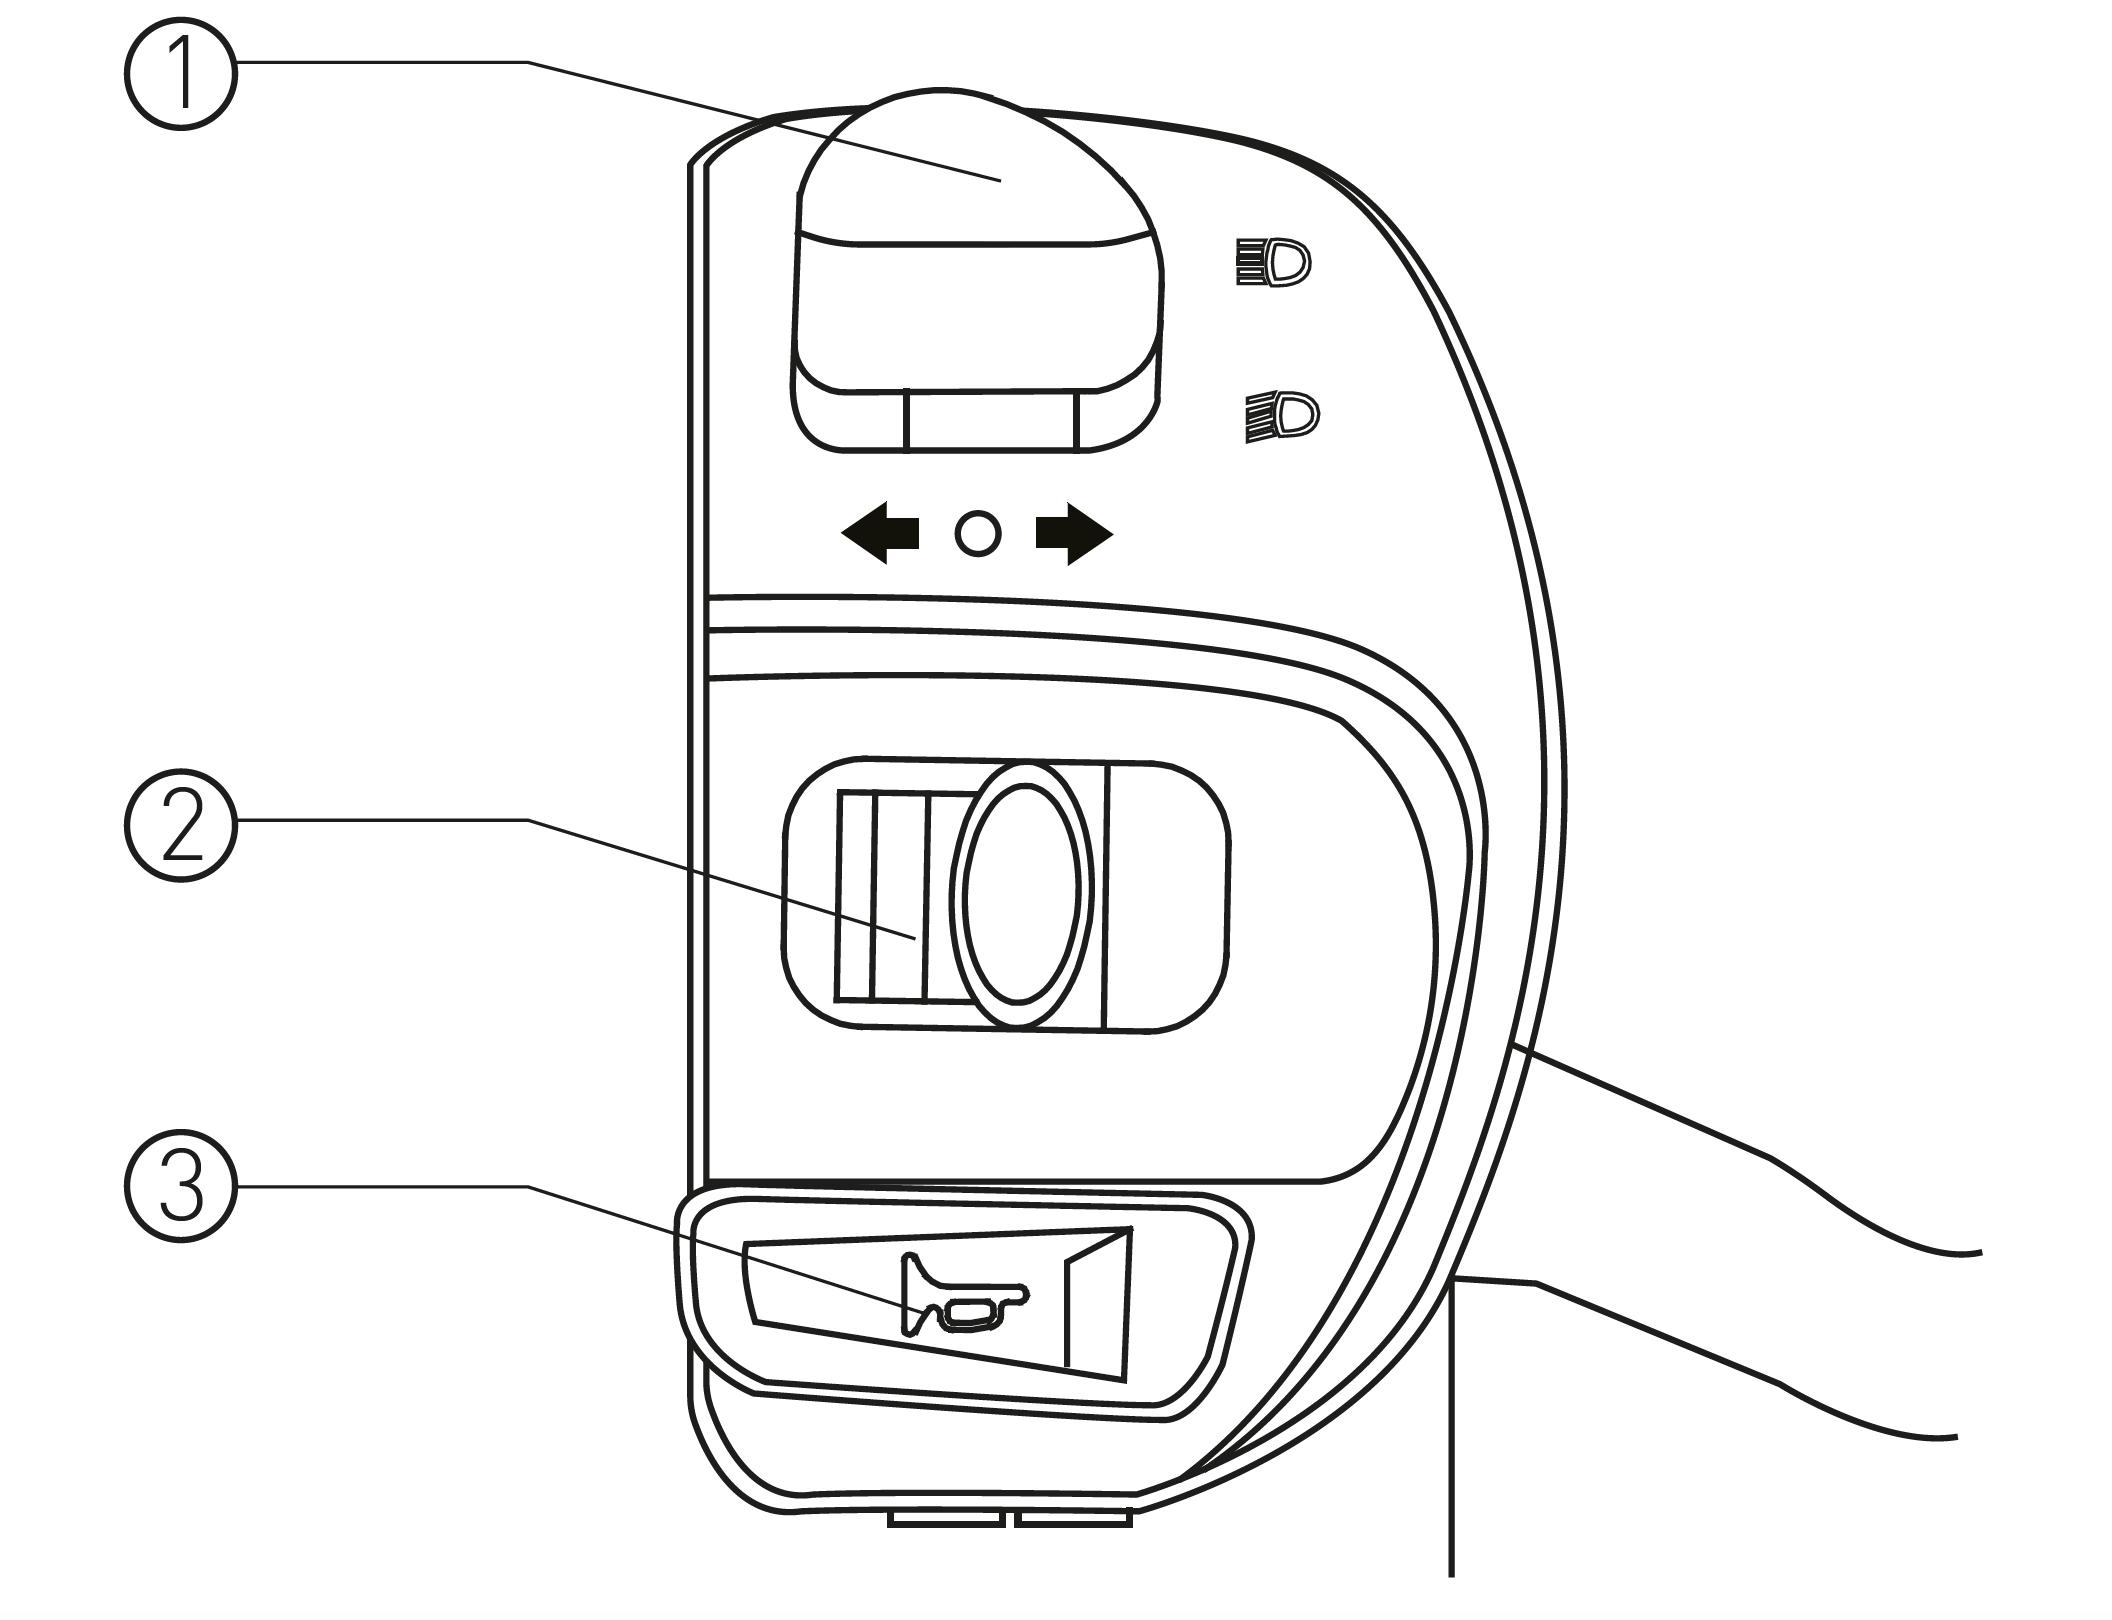 Linke Armaturen des S6 max Elektro-Motorrollers von Nova Motors